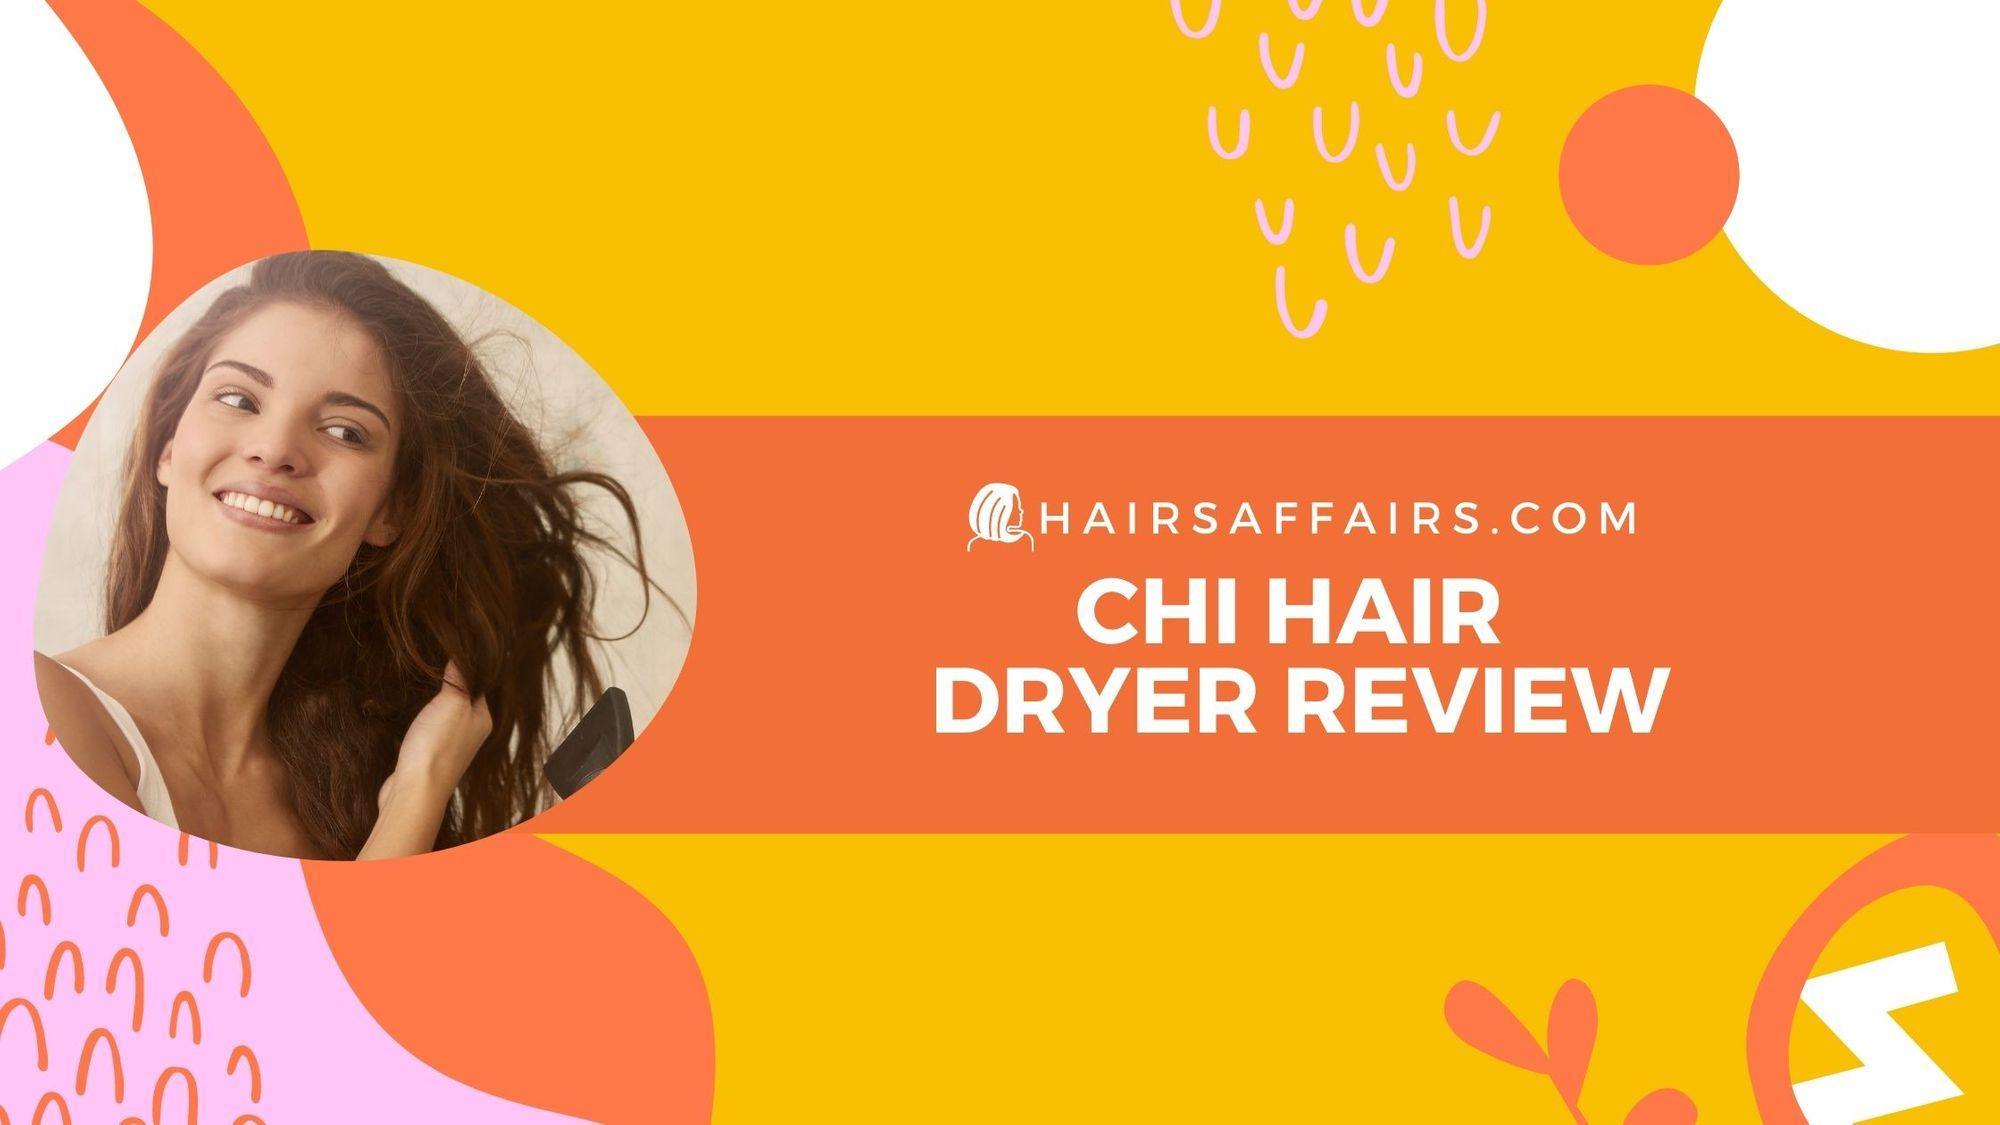 HA-Chi-hair-dryer-review